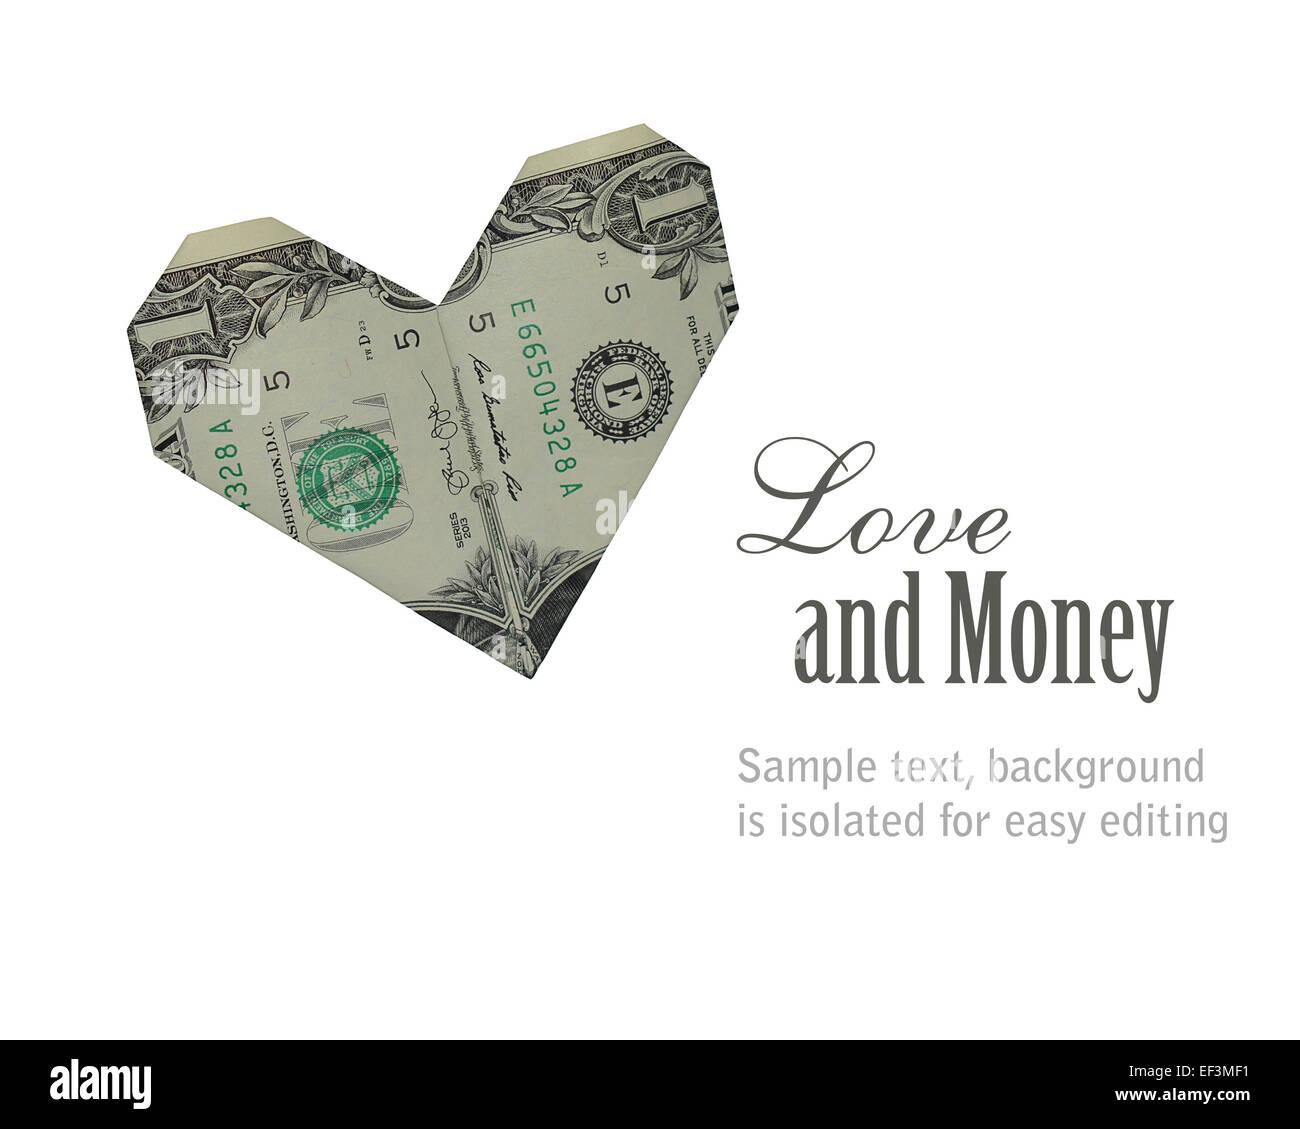 Concept image love and money us dollar bill folded into an concept image love and money us dollar bill folded into an origami heart shape isolated on white jeuxipadfo Images